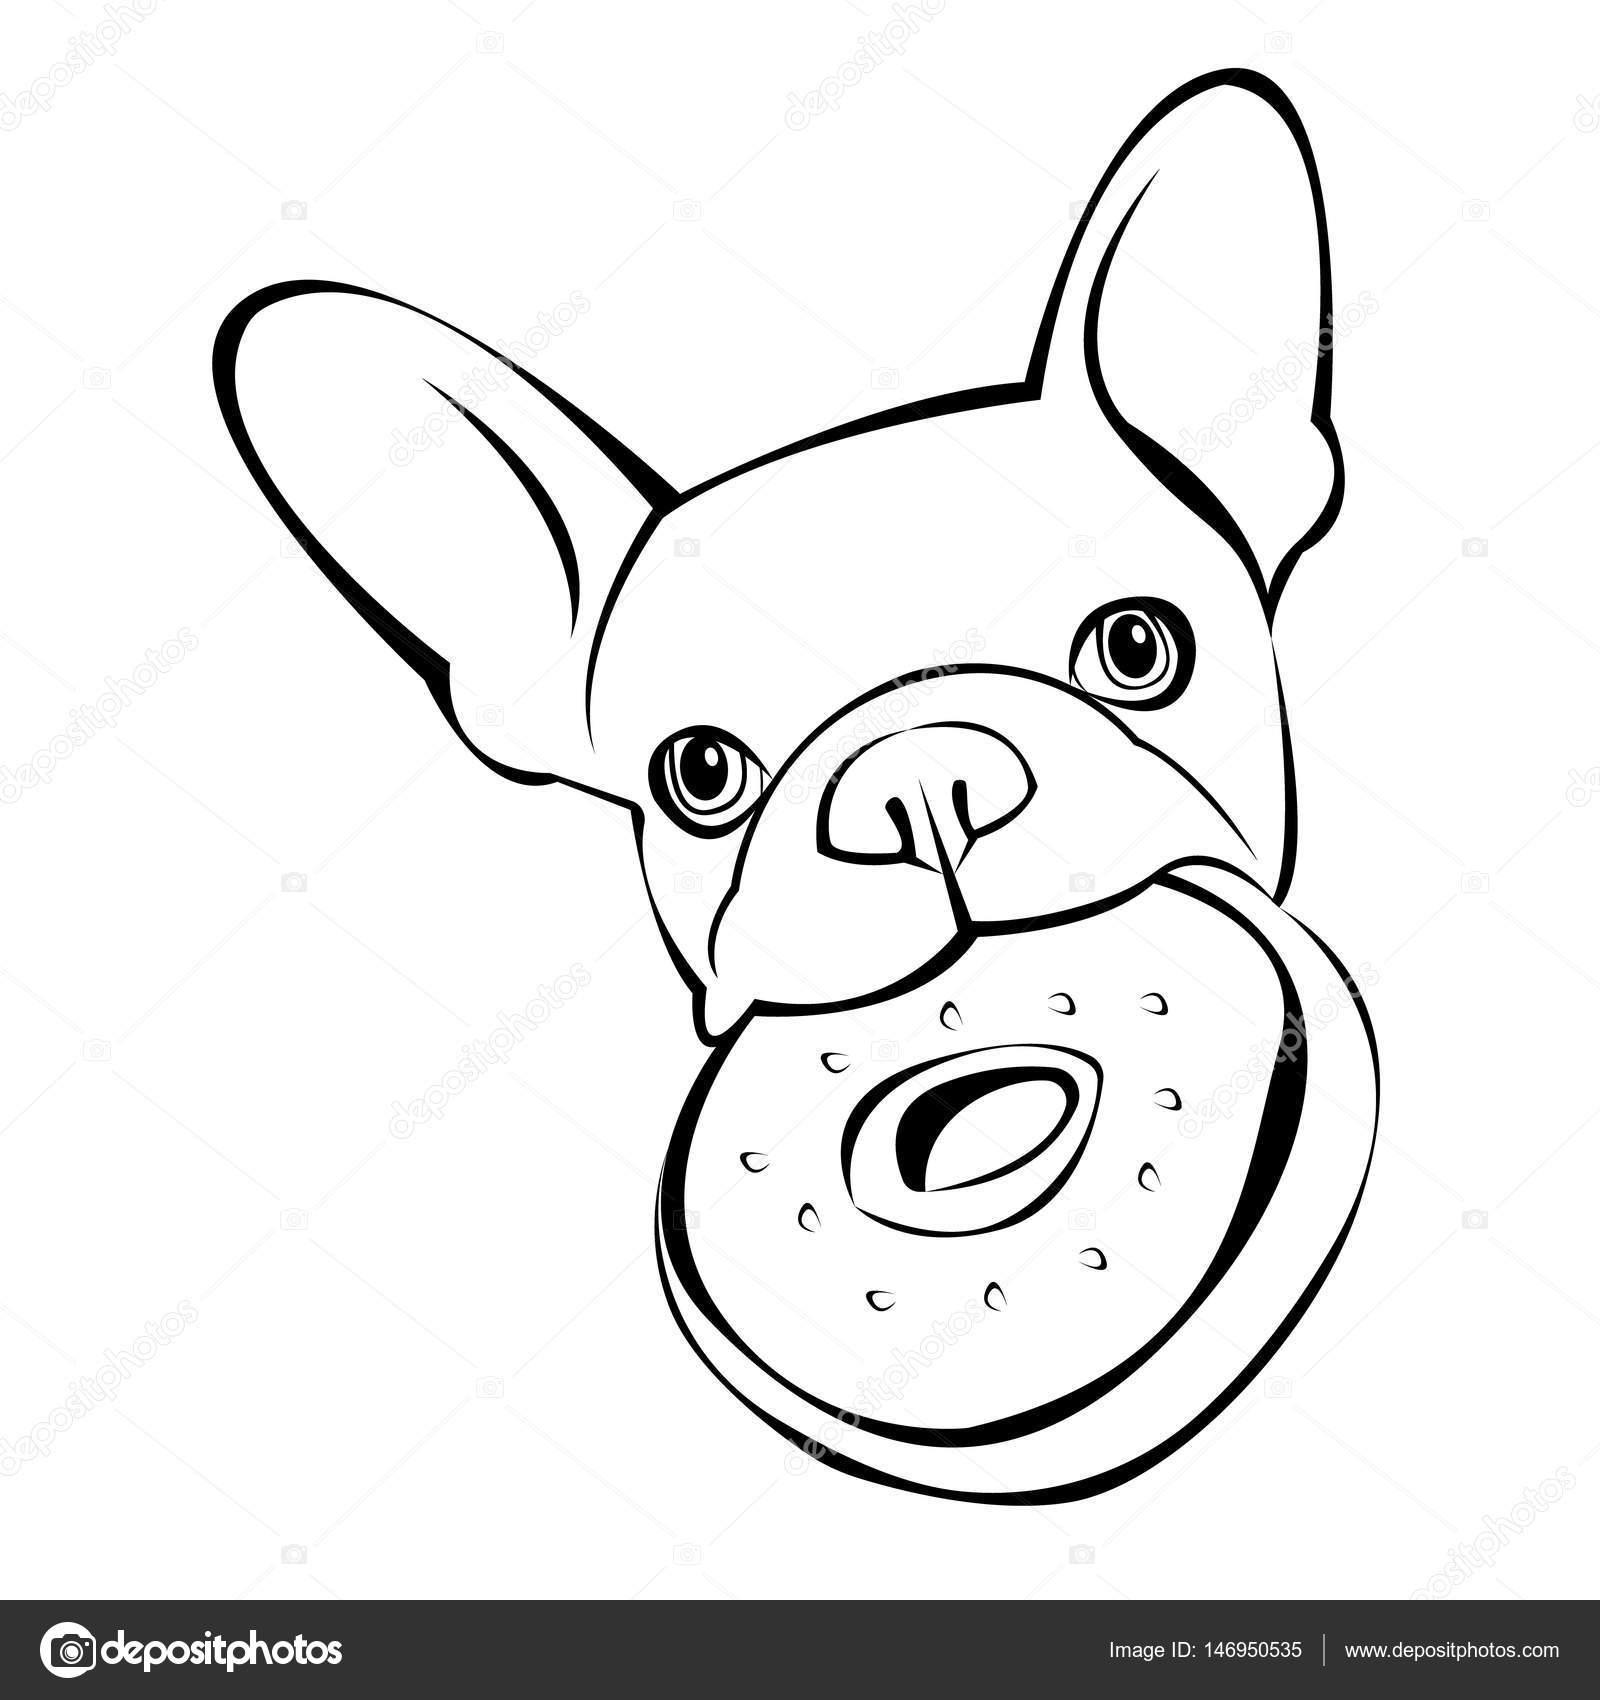 Geliefde Bulldog, hond, dier, Frans, vector, illustratie, huisdier, ras &CX89